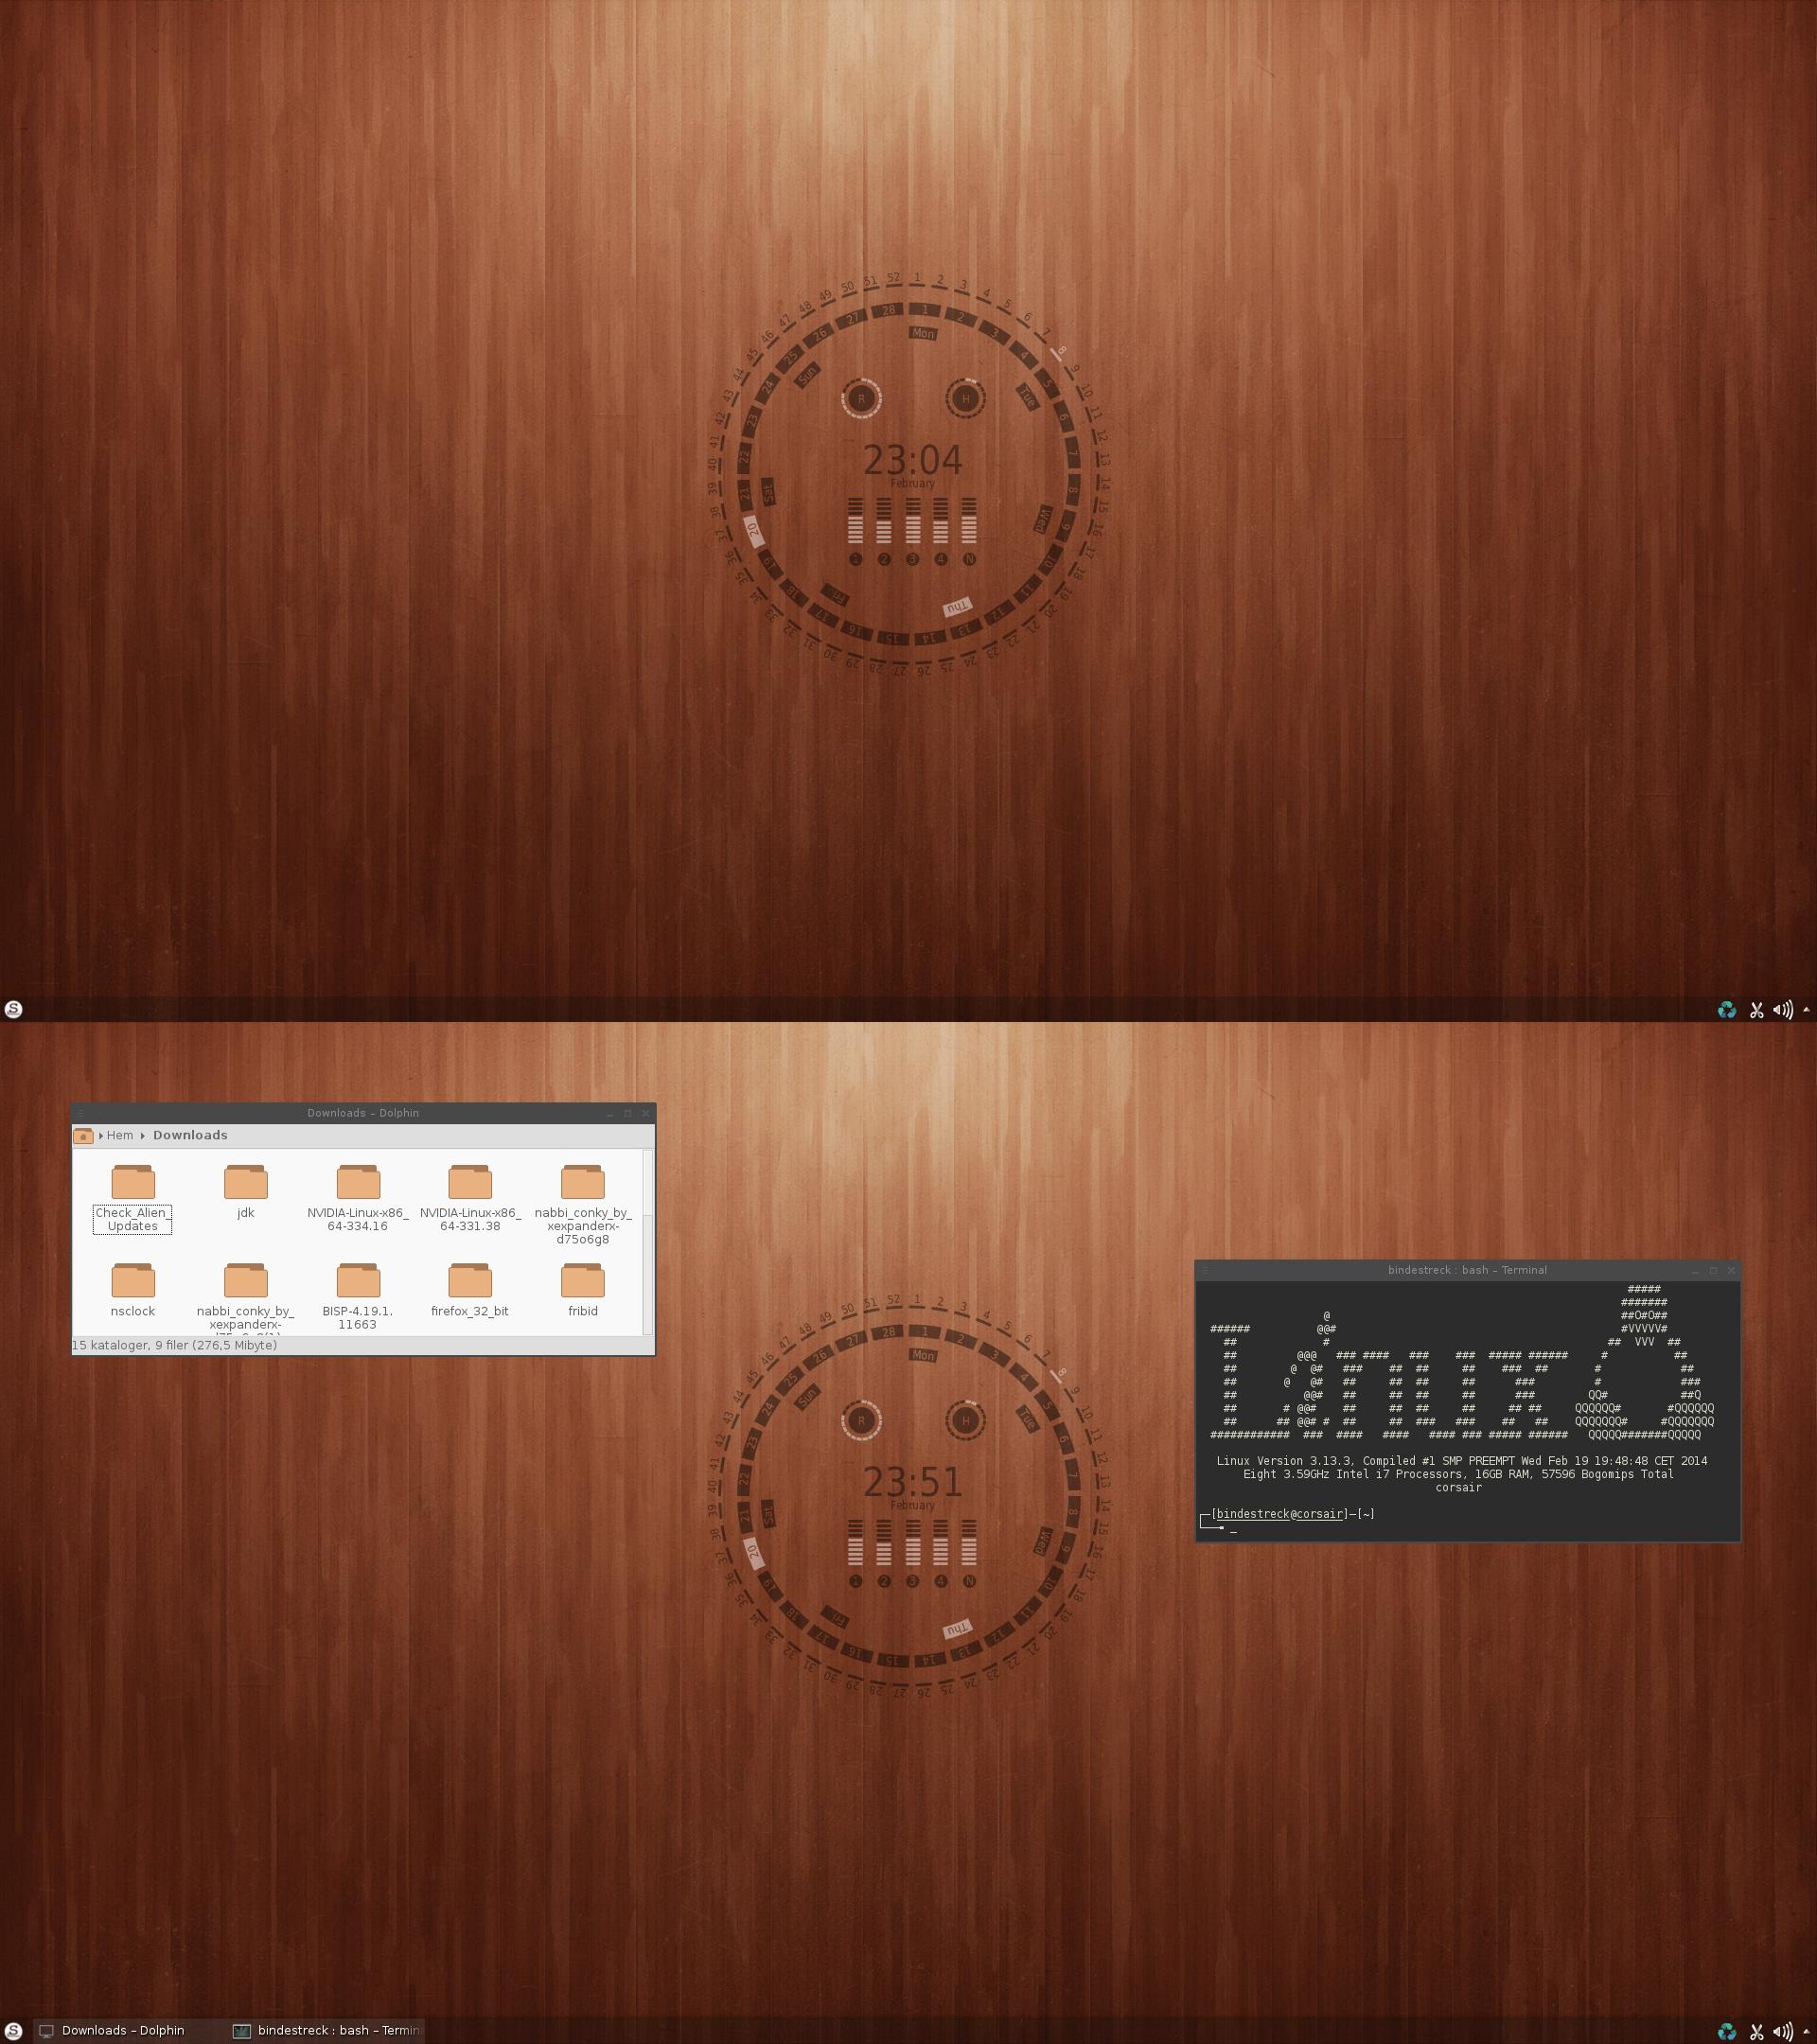 Conky Extra Slackware by xeXpanderx